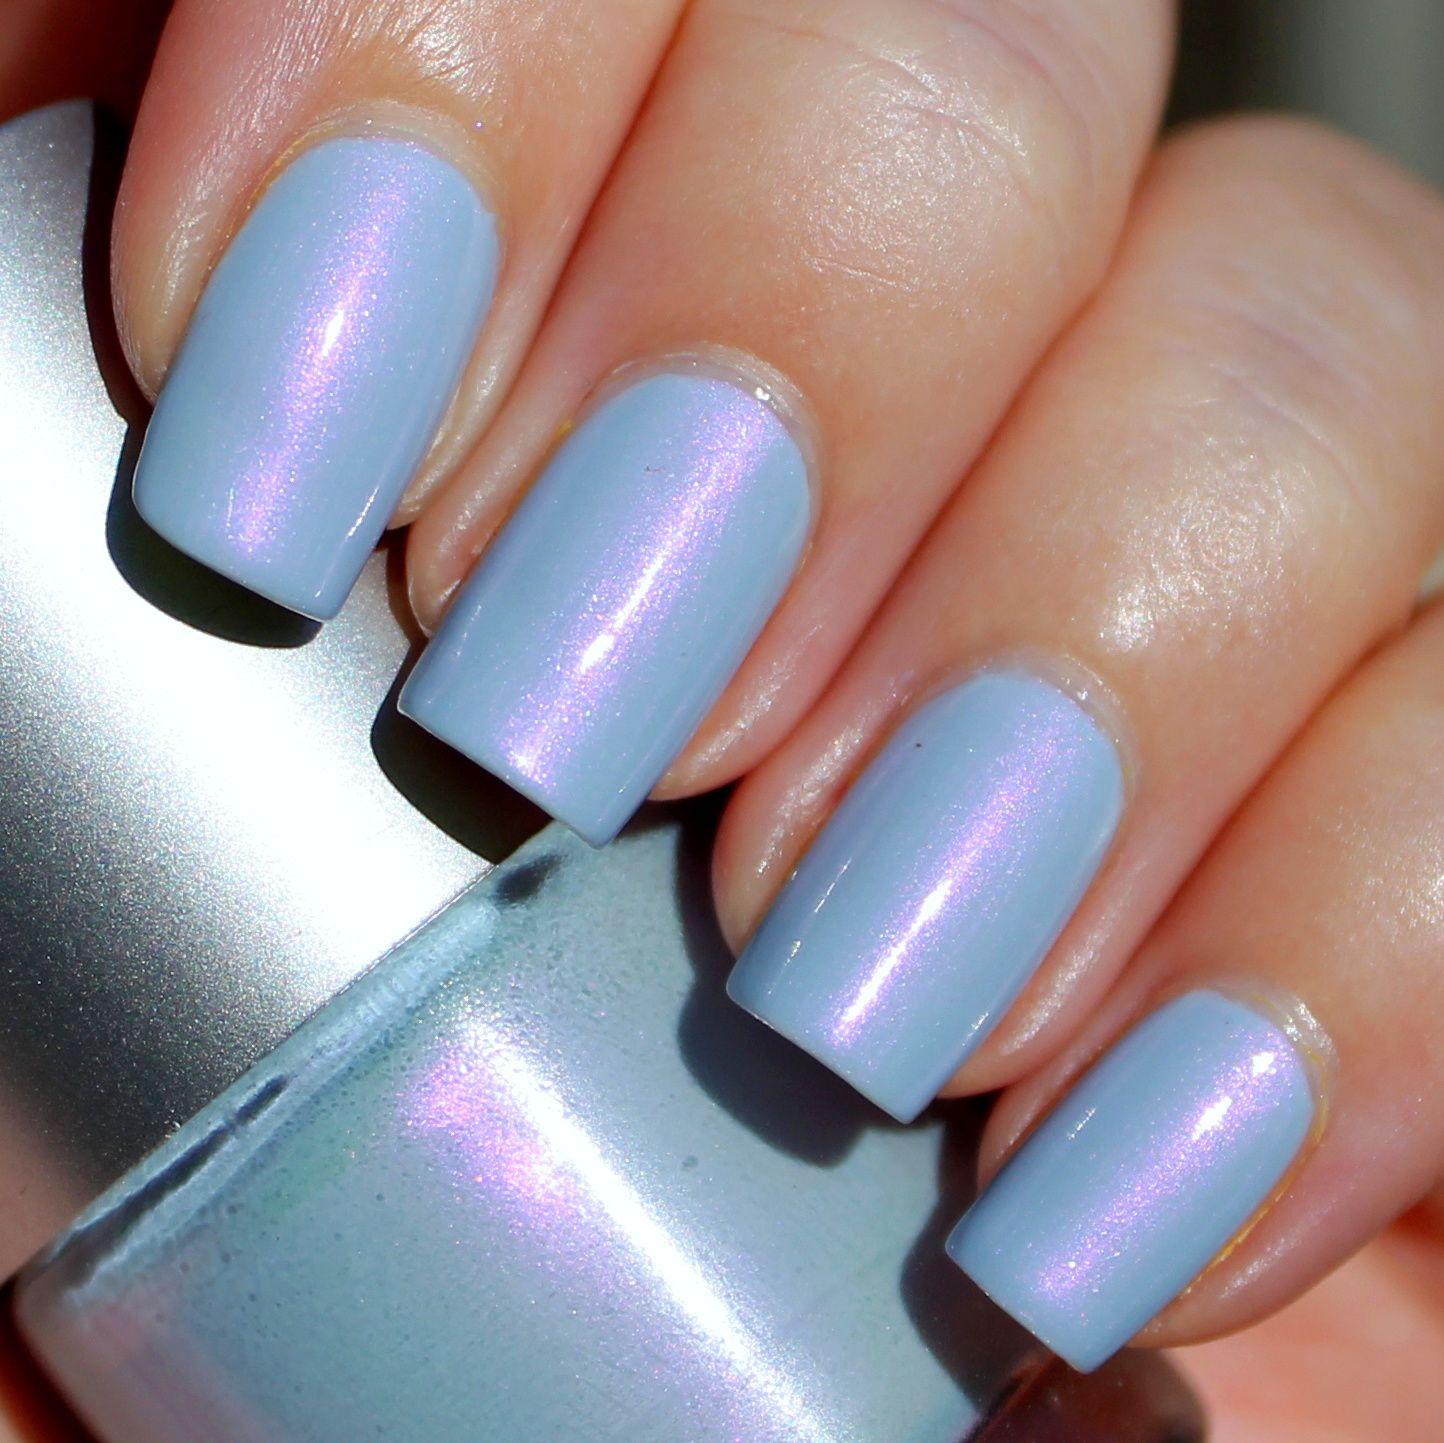 Duri Cosmetics Rejuvacote / Franken Polish Over the Rainbow / Poshe Top Coat